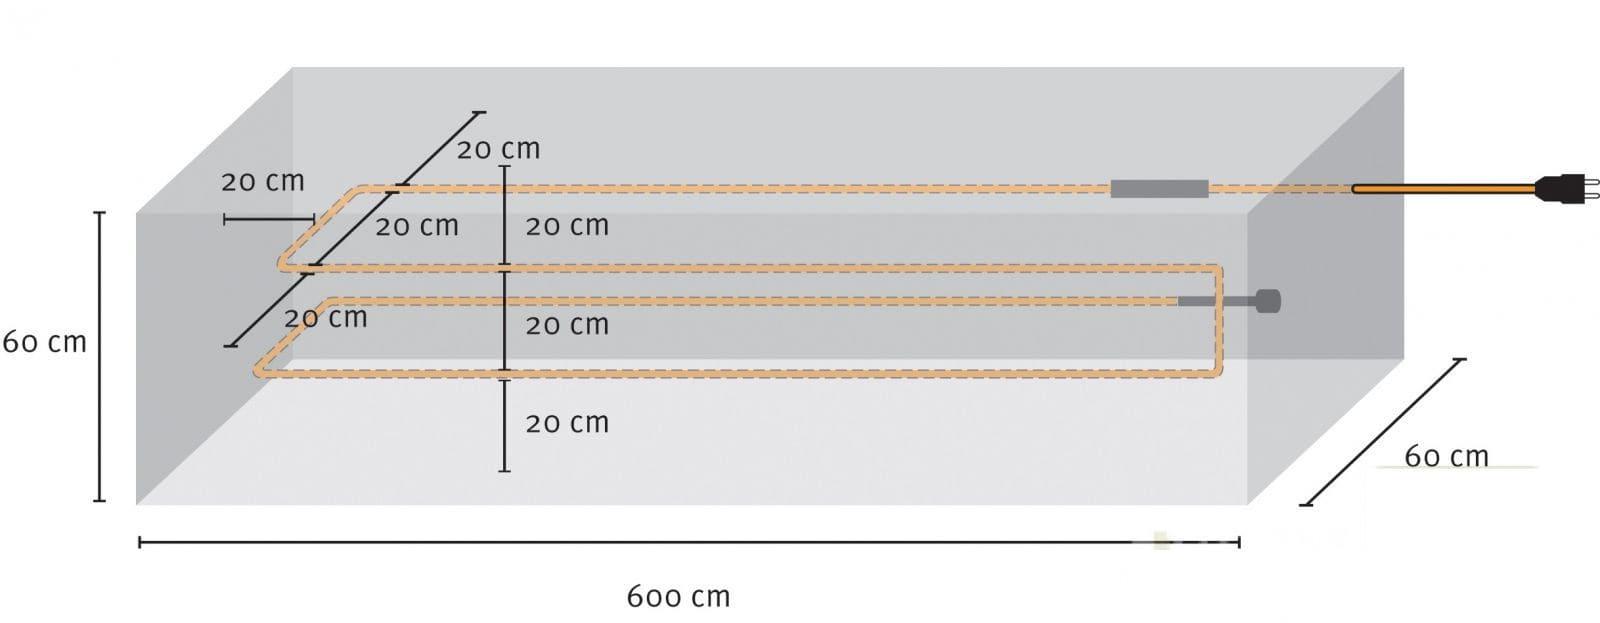 Perhitungan panjang kabel pemanas